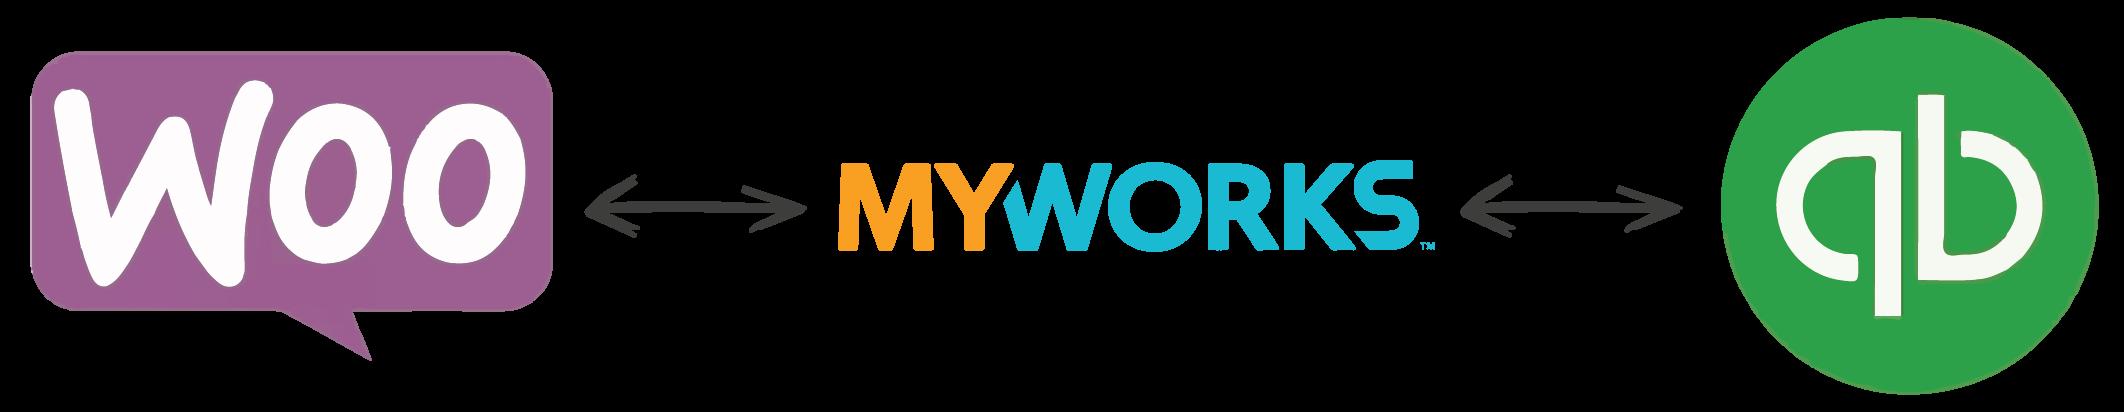 WooCommerce QuickBooks integration - MyWorks Plugin